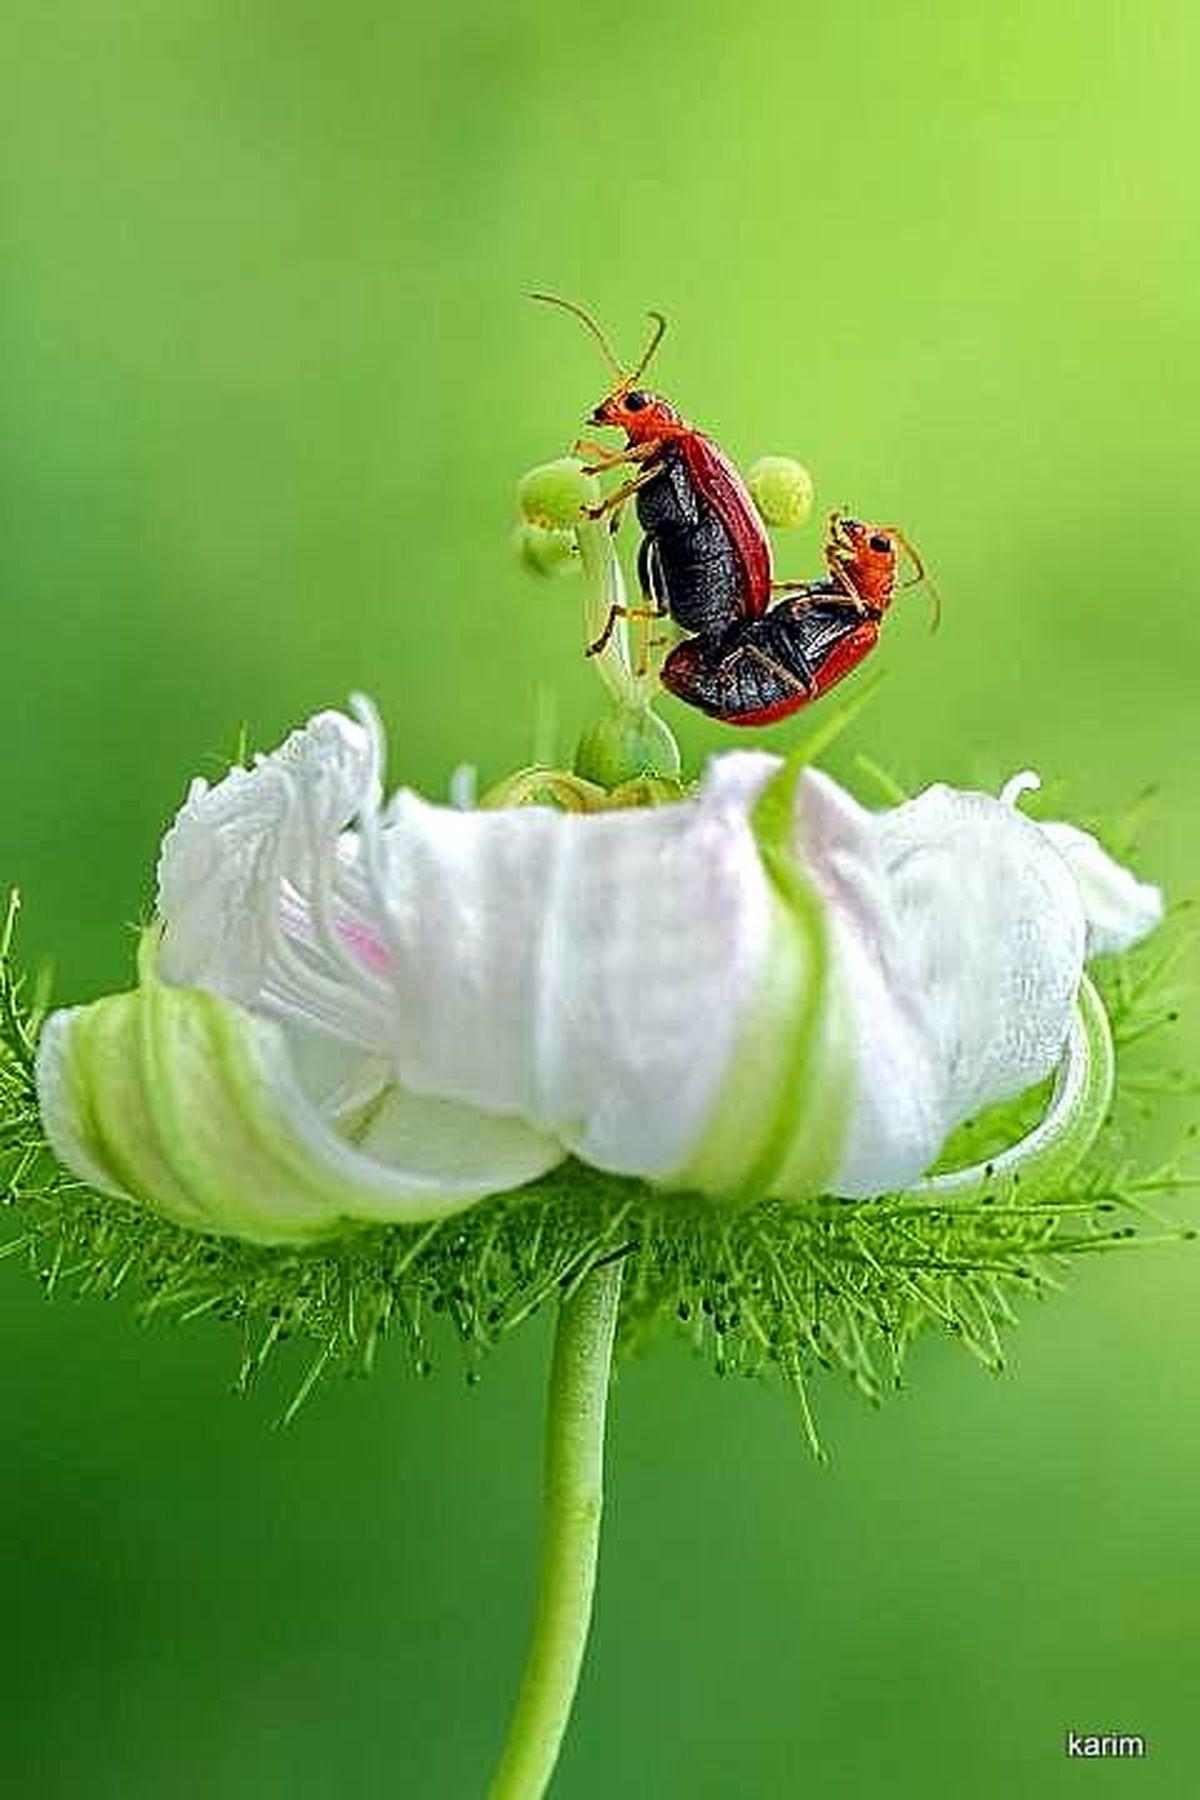 Ladybug Macro Photography Insect Photography EyeEm Nature Lover